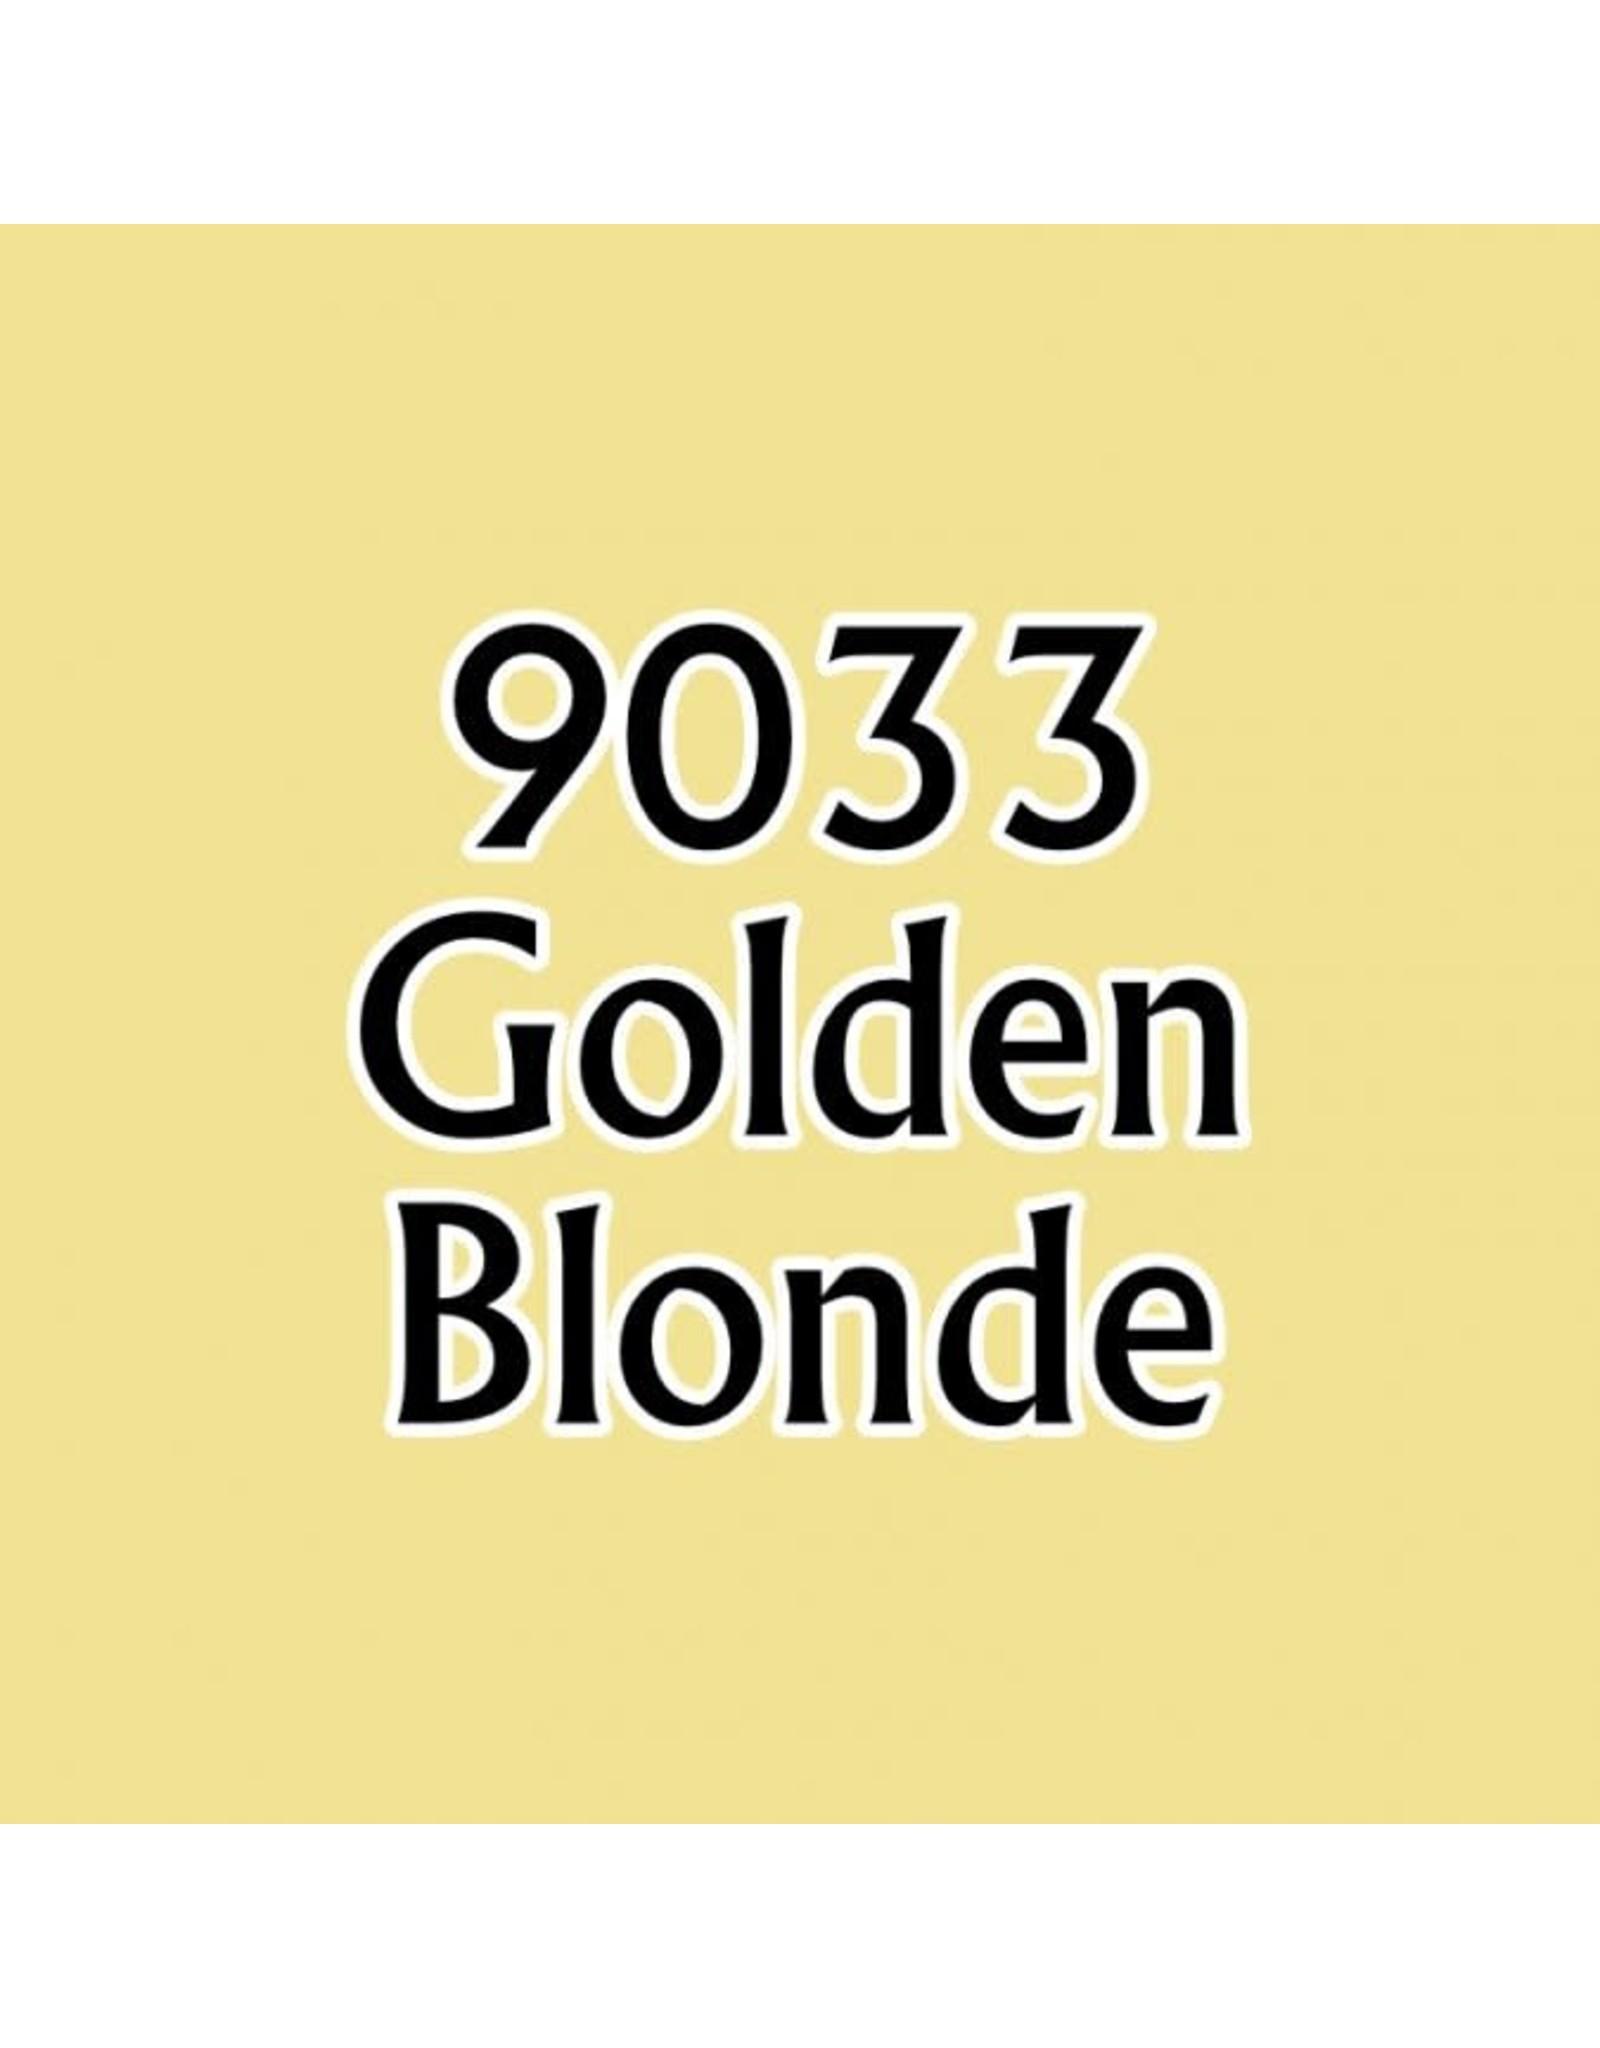 Reaper Golden Blonde 1/2oz : Master Series Paints